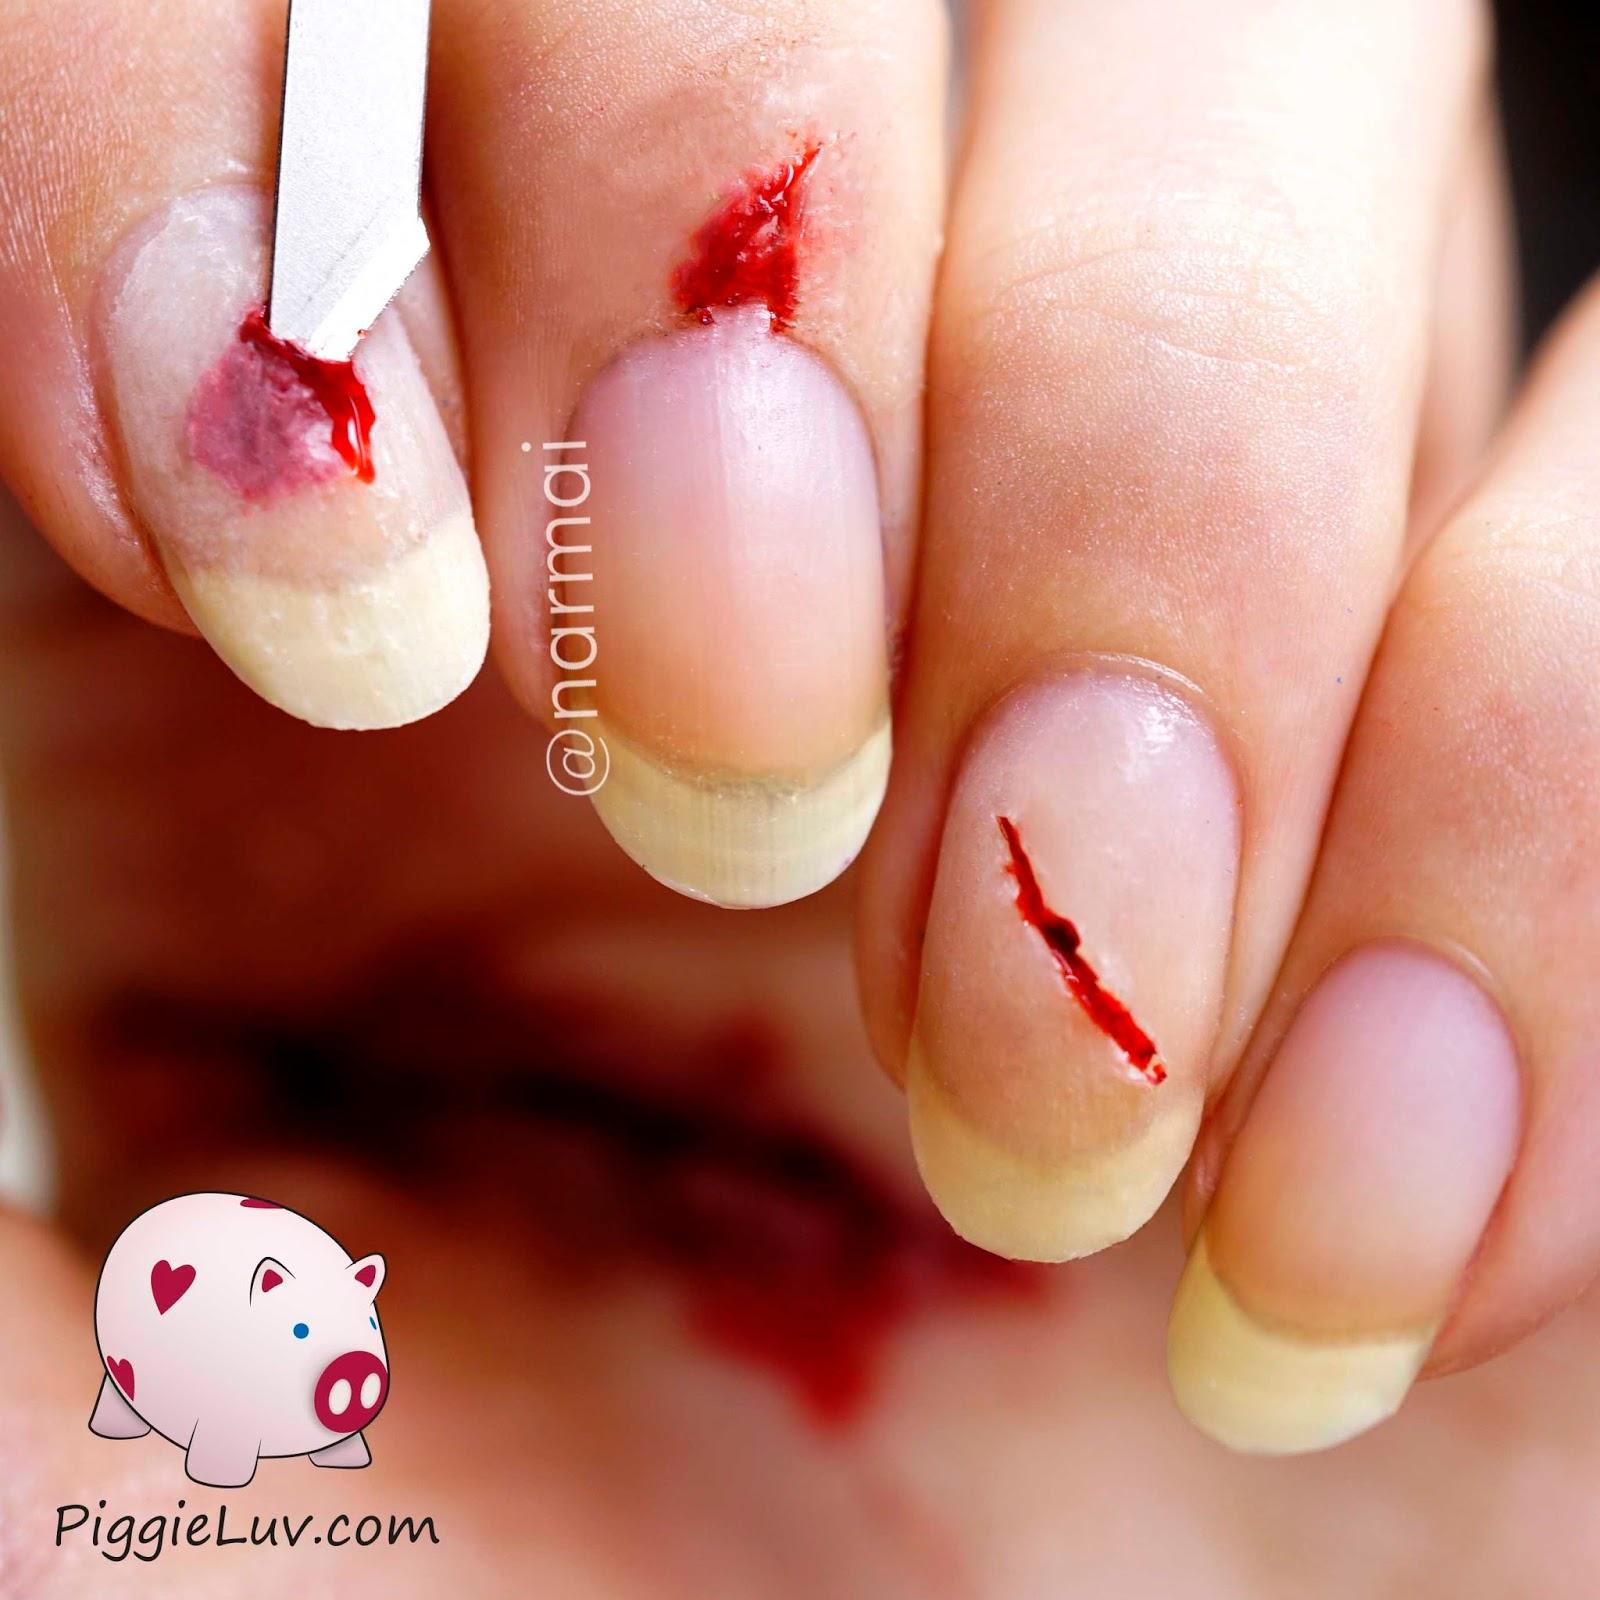 PiggieLuv: Bloody razor cuts nail art for Halloween